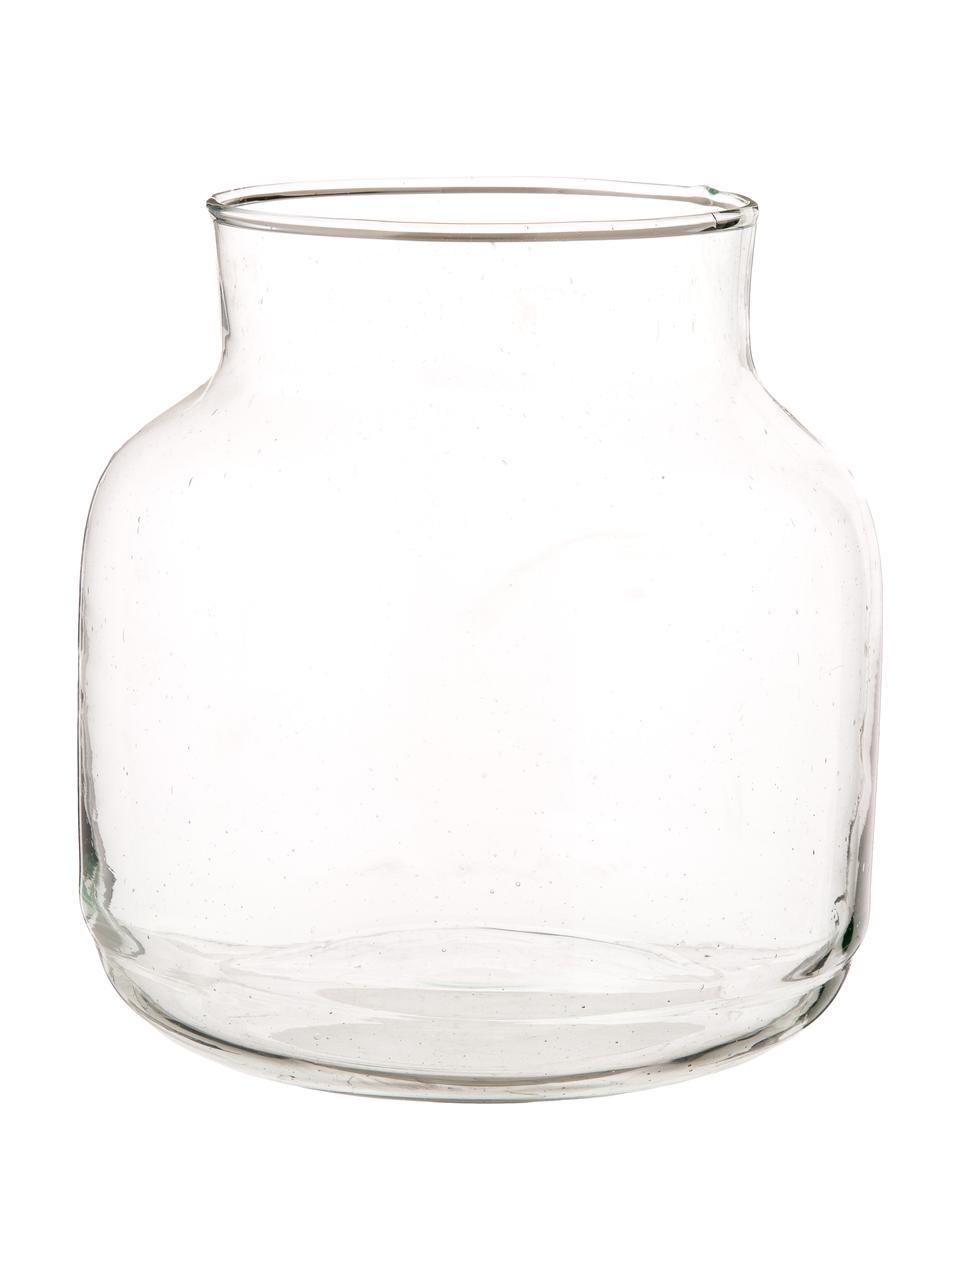 Mundgeblasene Vase Dona aus recyceltem Glas, Recyceltes Glas, Transparent, Ø 22 x H 23 cm